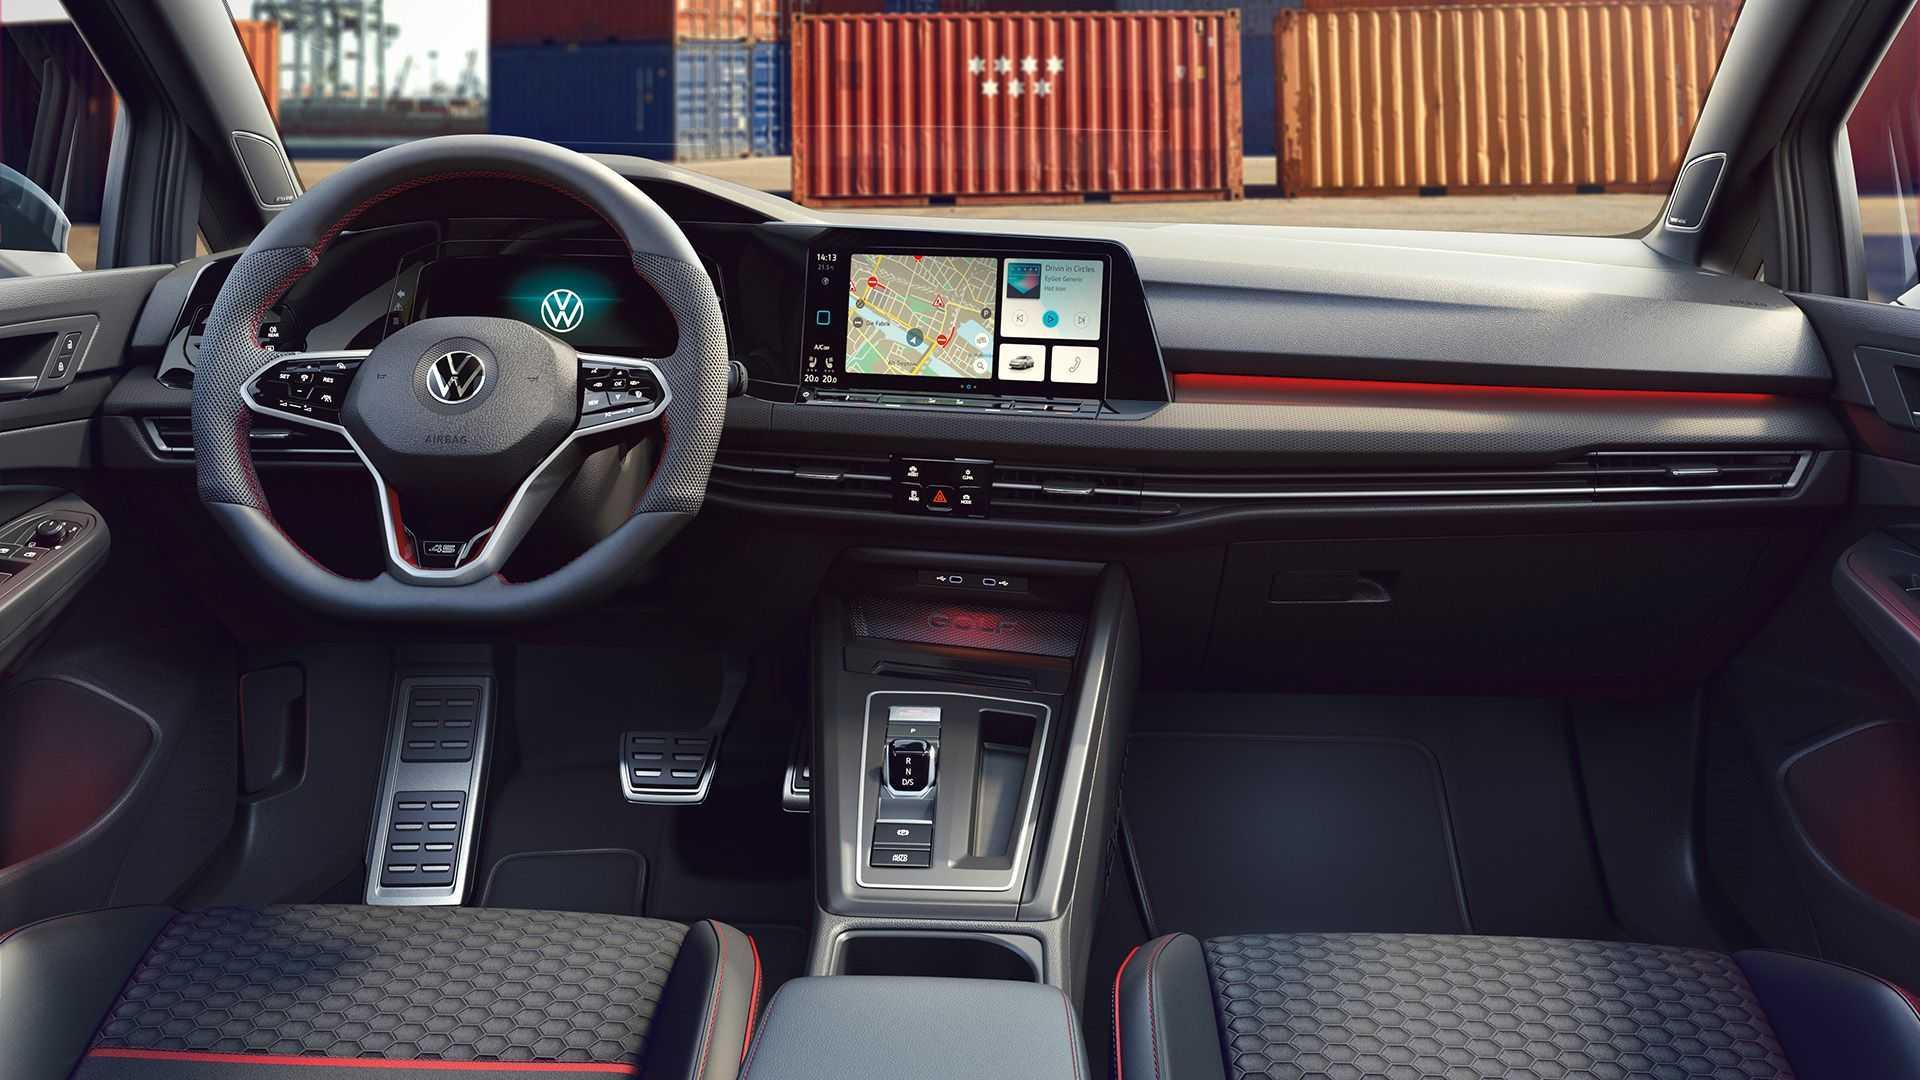 Volkswagen відзначив 45-річчя своїх хот-хетч спецверсією «Гольфа»